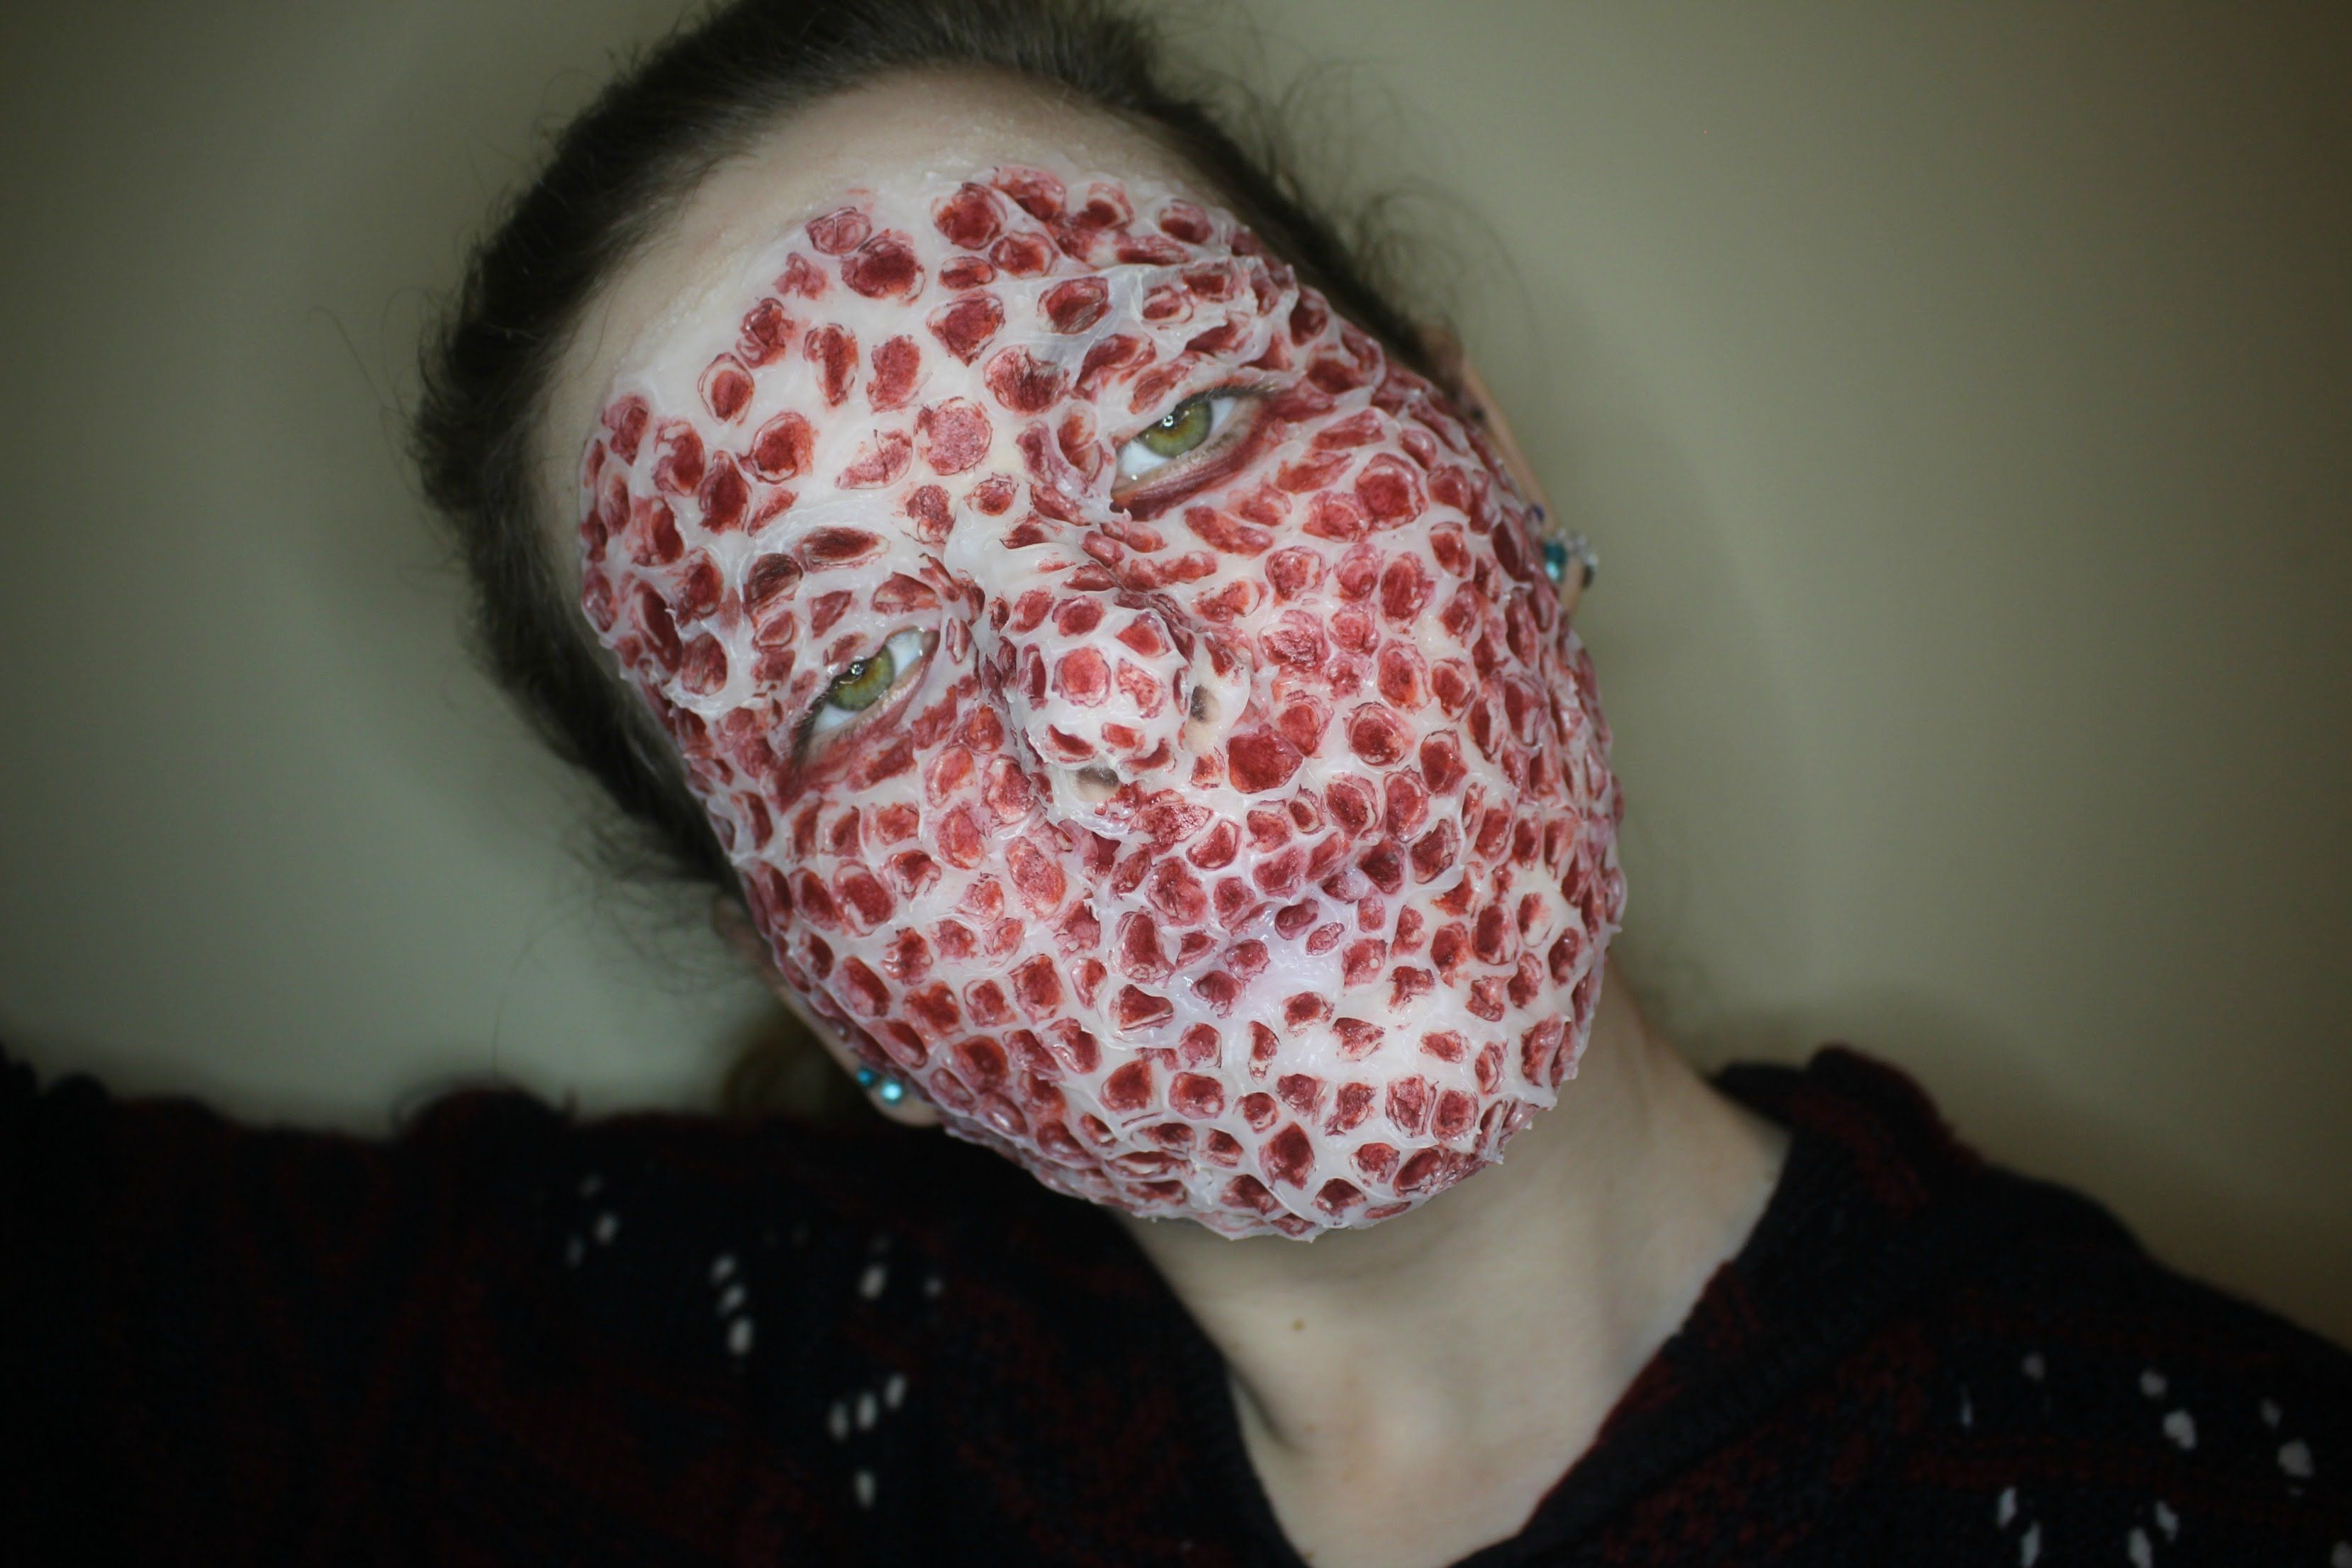 trypophobia sfx makeup tutorial graphic grin and dagger phobiasspecial effectsmakeup tutorialshalloween costumes - Phobia Halloween